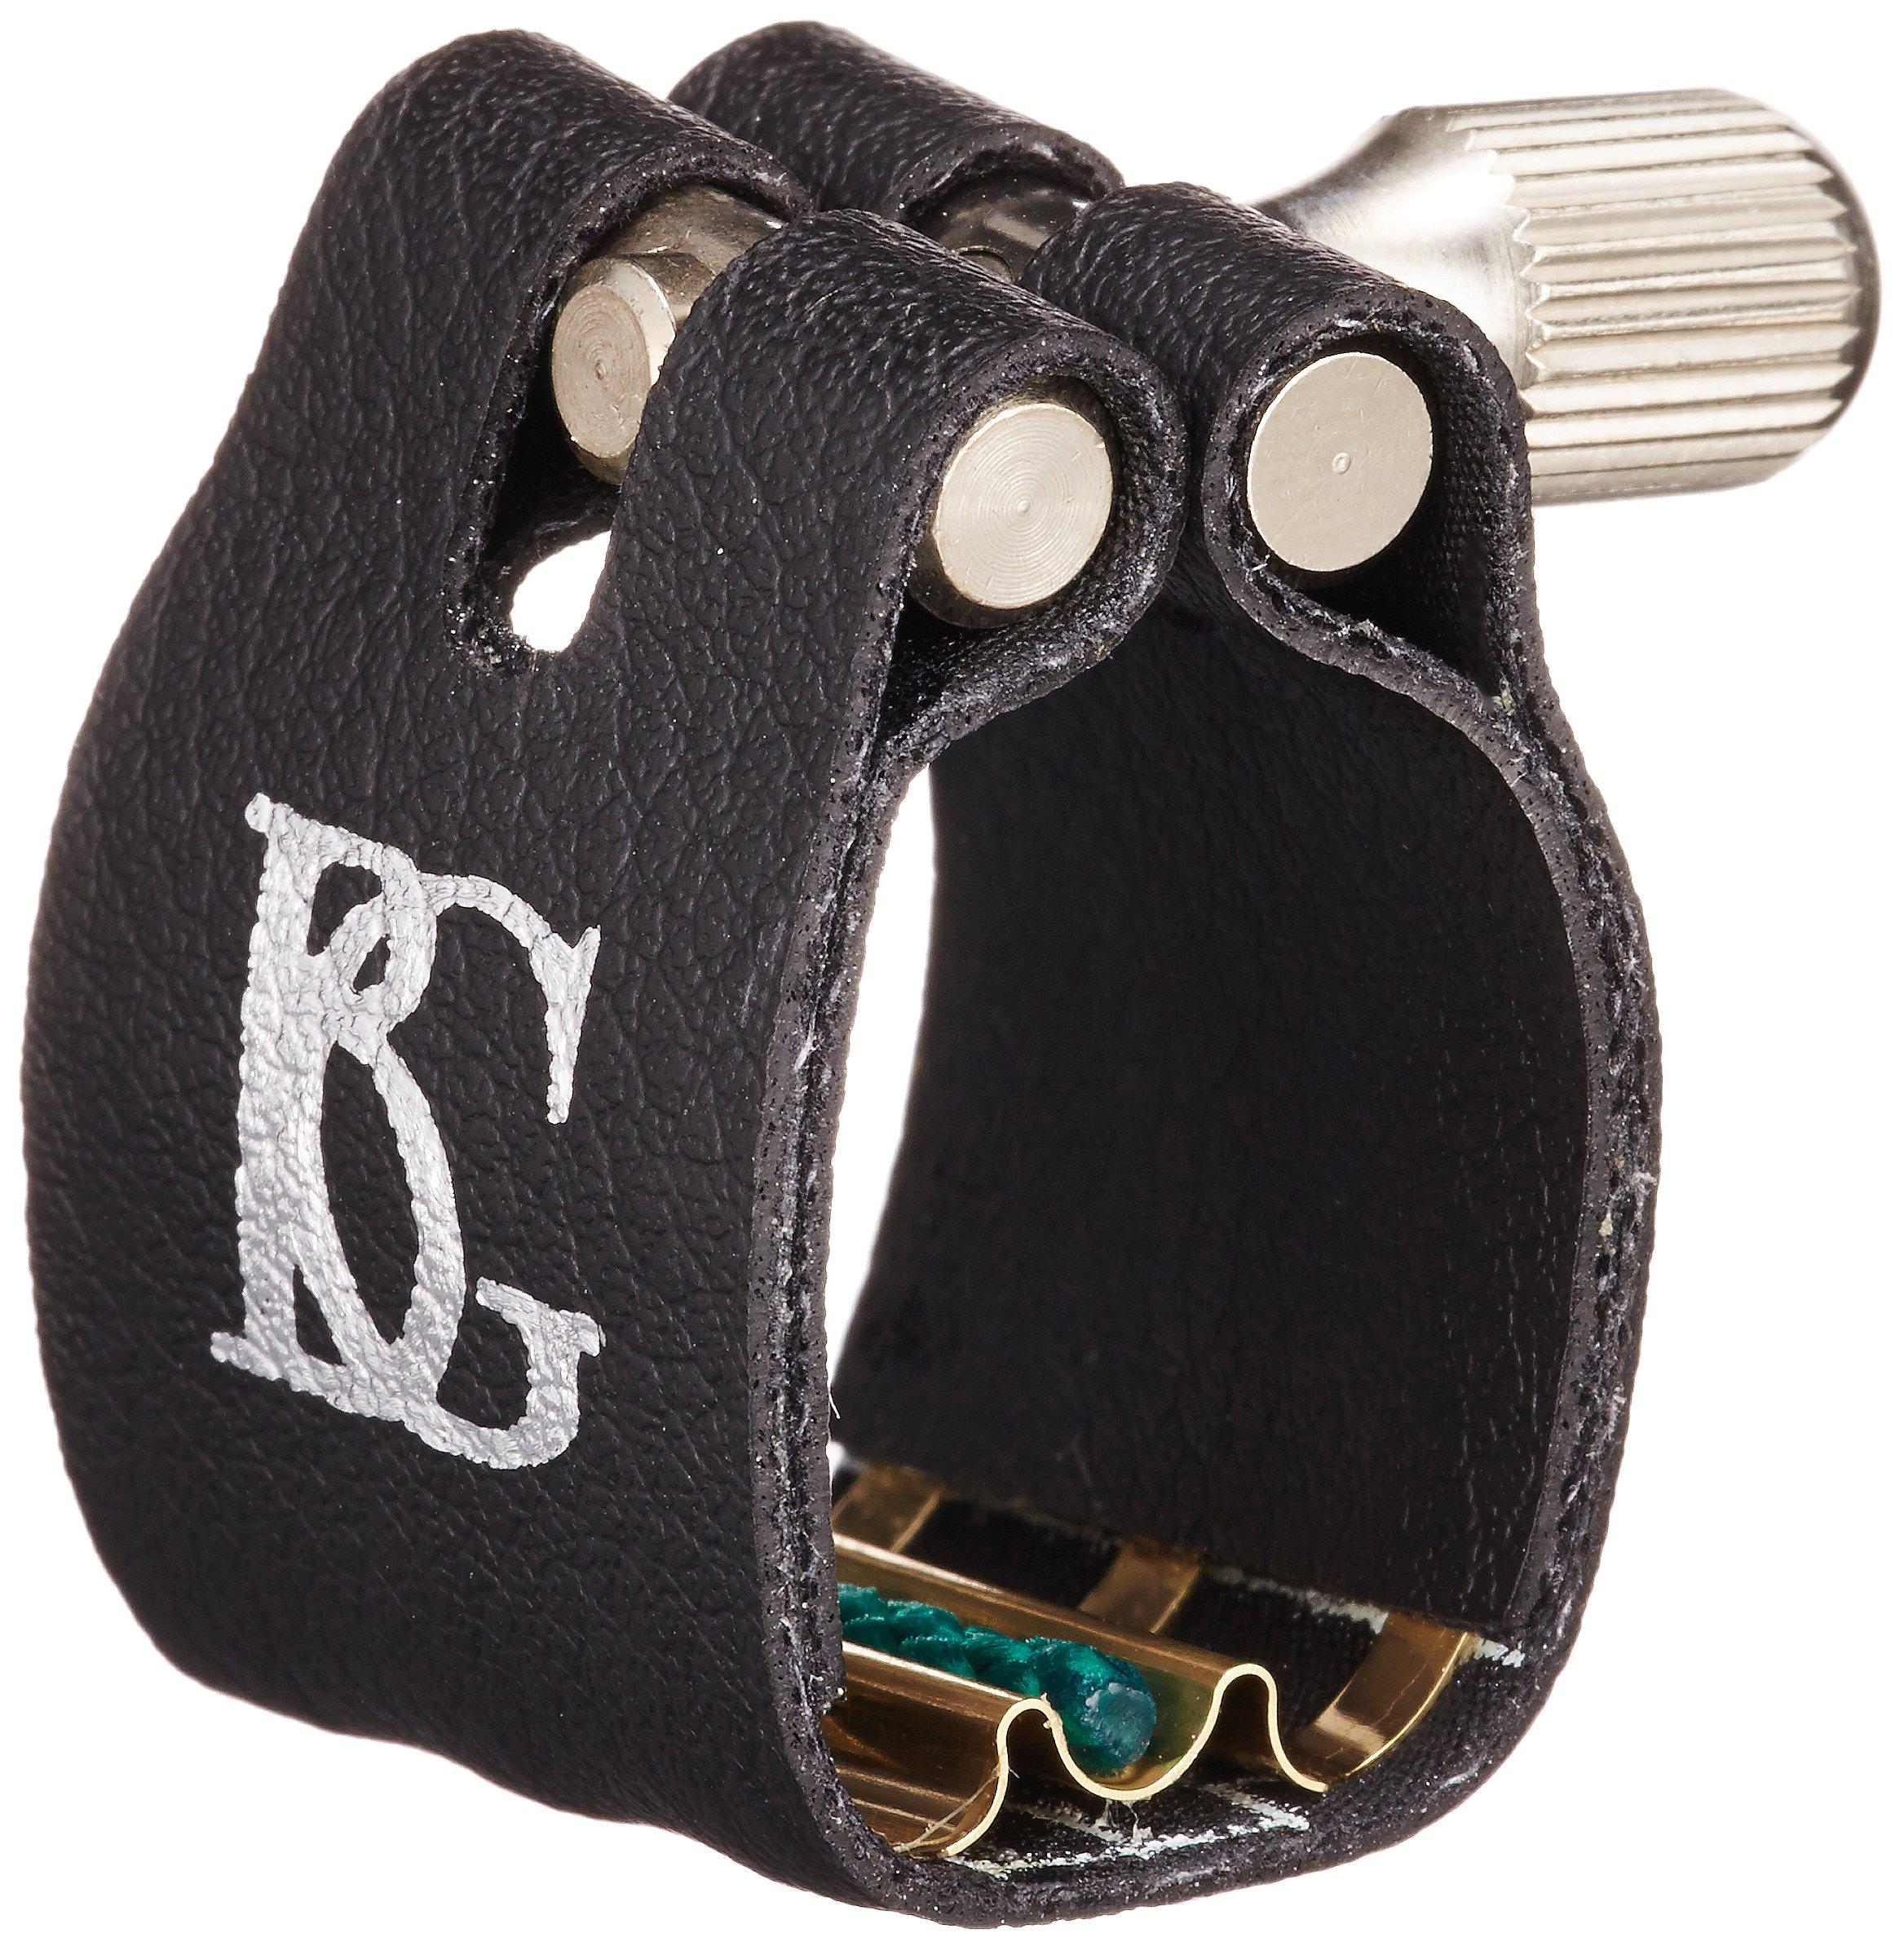 BG L7SR Sup Revelation Ligature with Cap for Bb German Clarinet